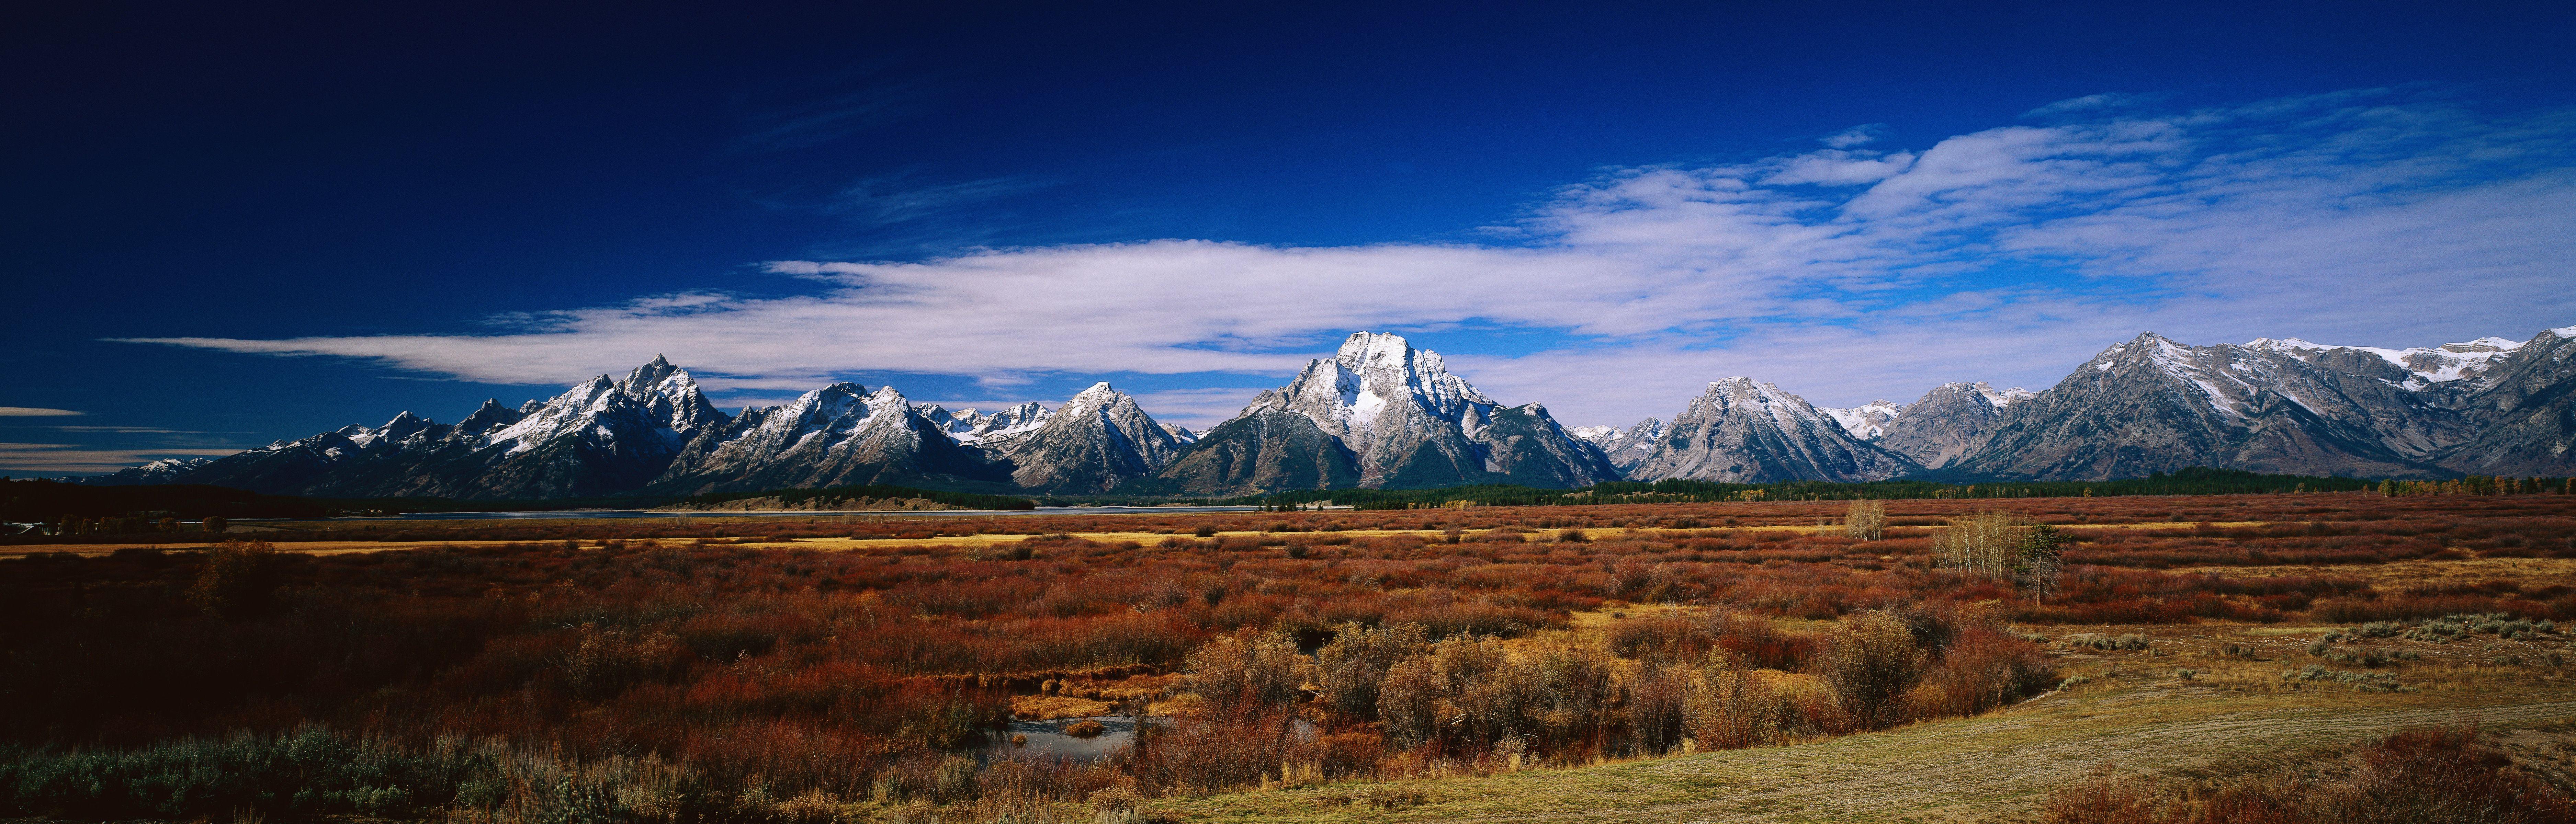 Jackson Hole Wyoming Dual Screen Wallpaper Dual Monitor Wallpaper Mountains